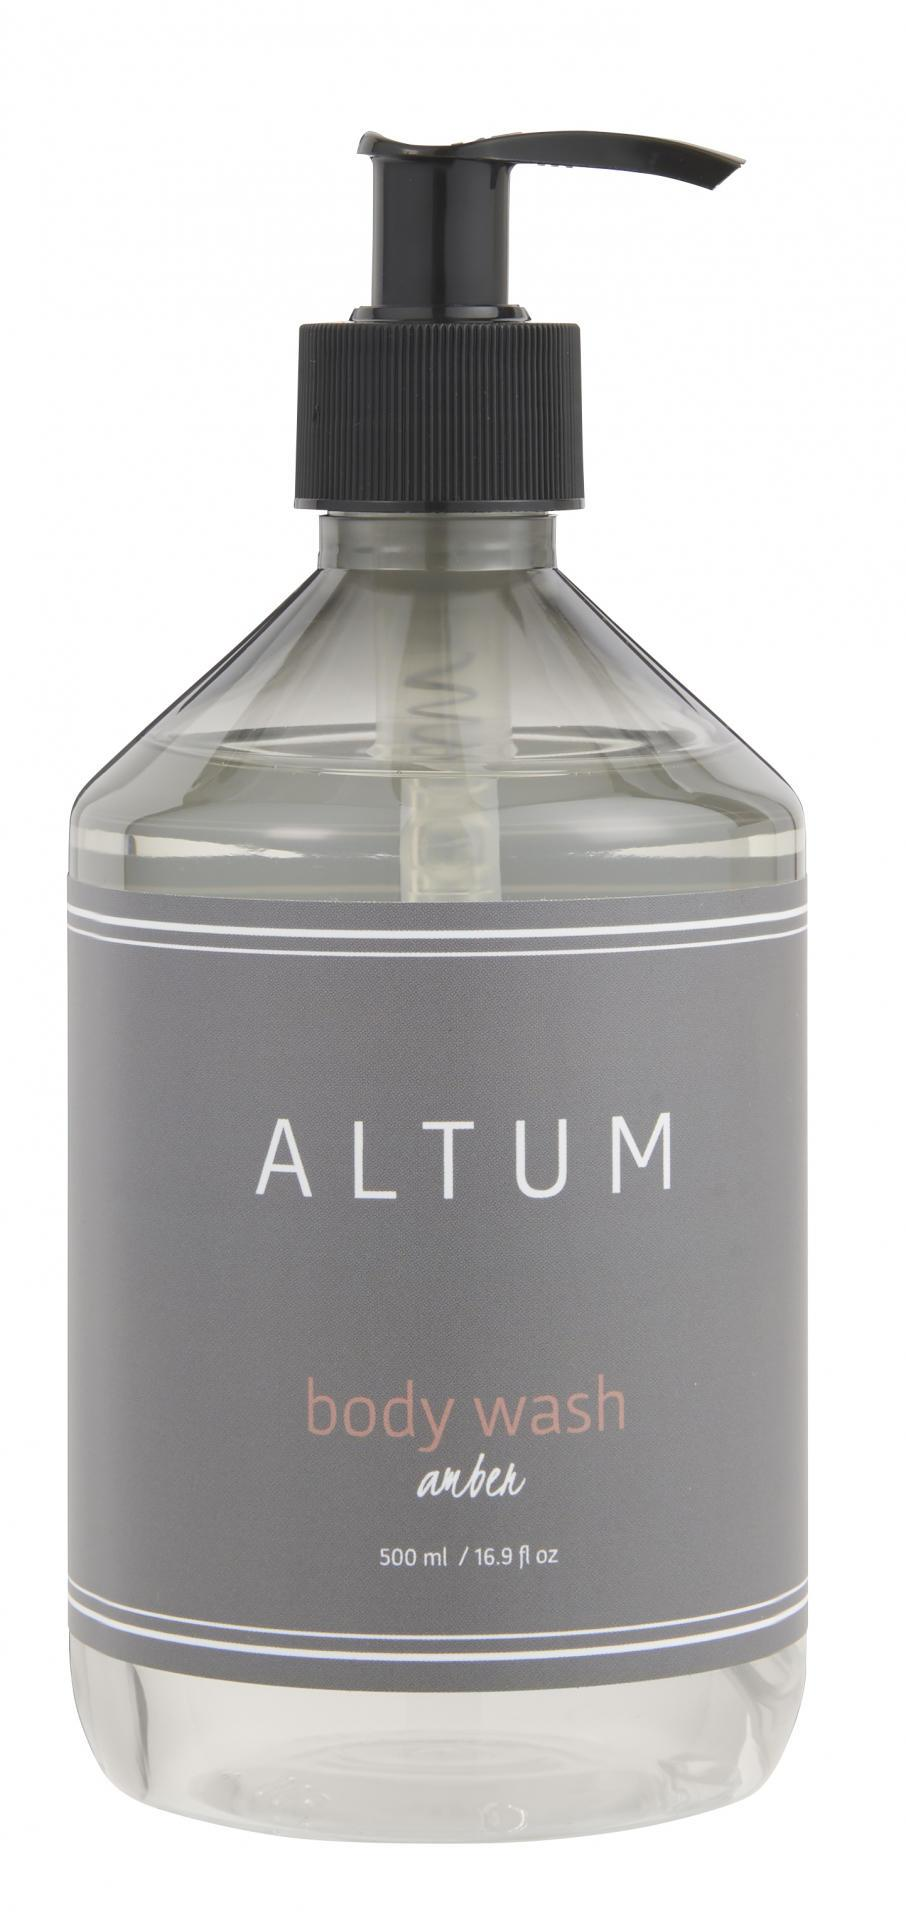 IB LAURSEN Sprchový gel ALTUM - Amber 500ml, šedá barva, plast